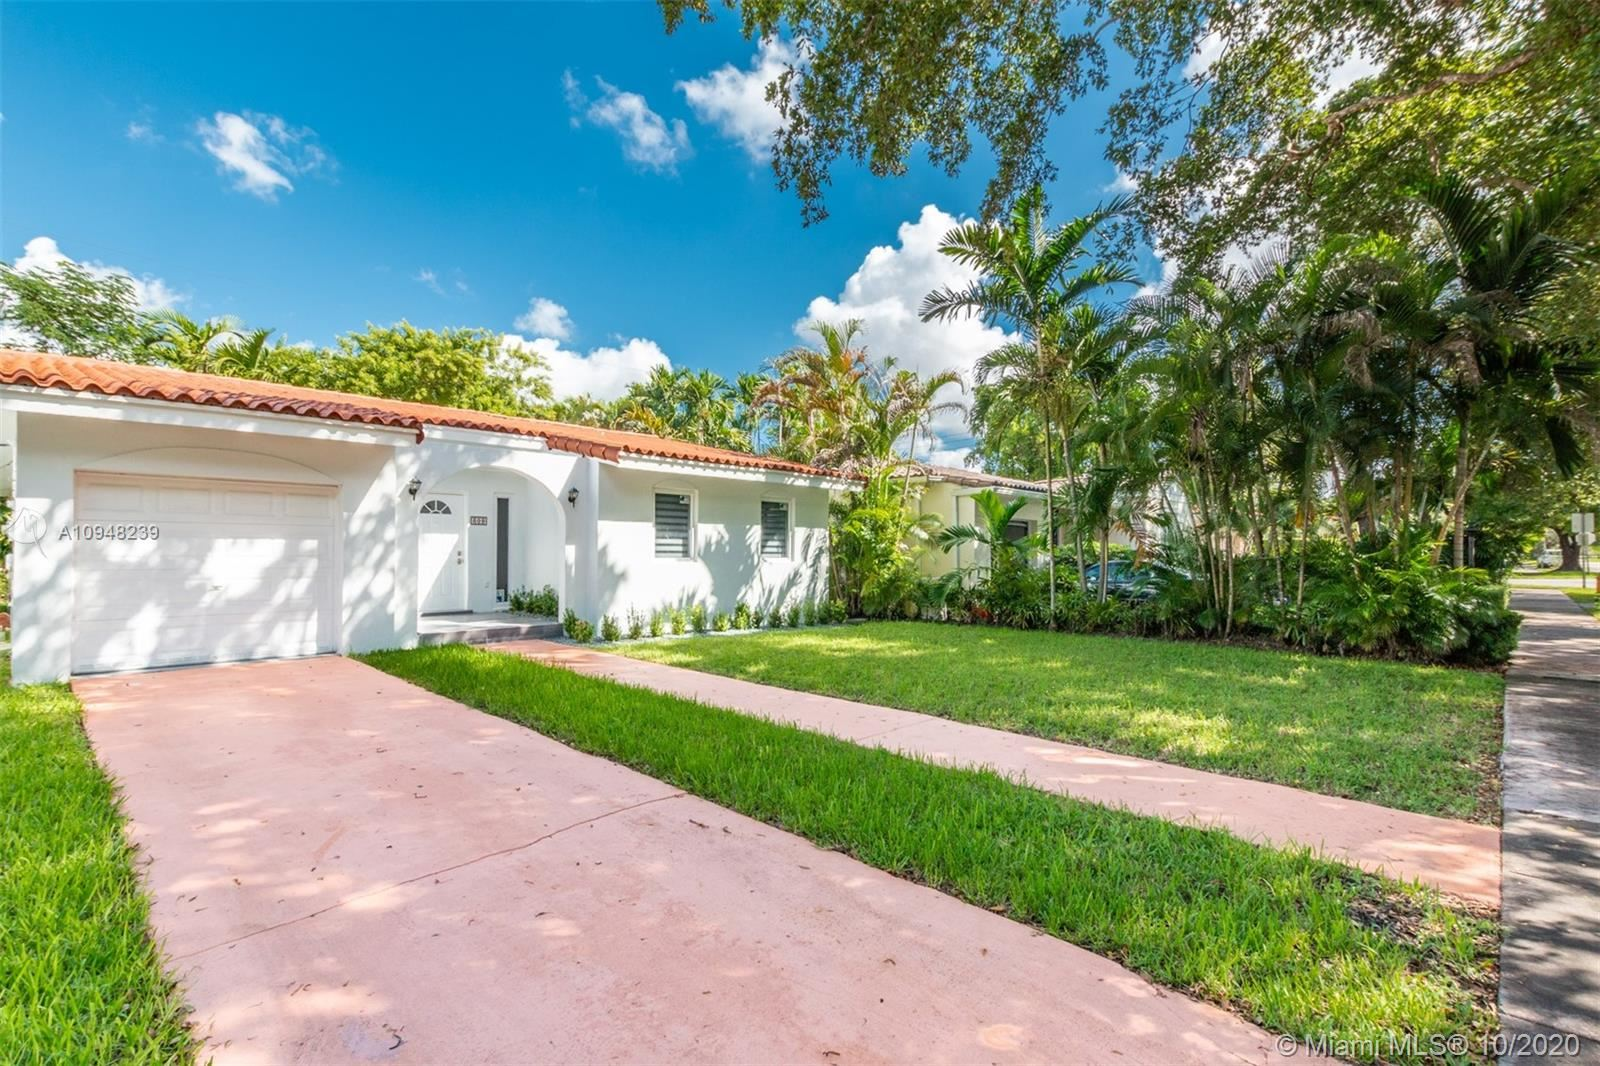 809 Milan Ave, Coral Gables, FL 33134 - #: A10948239